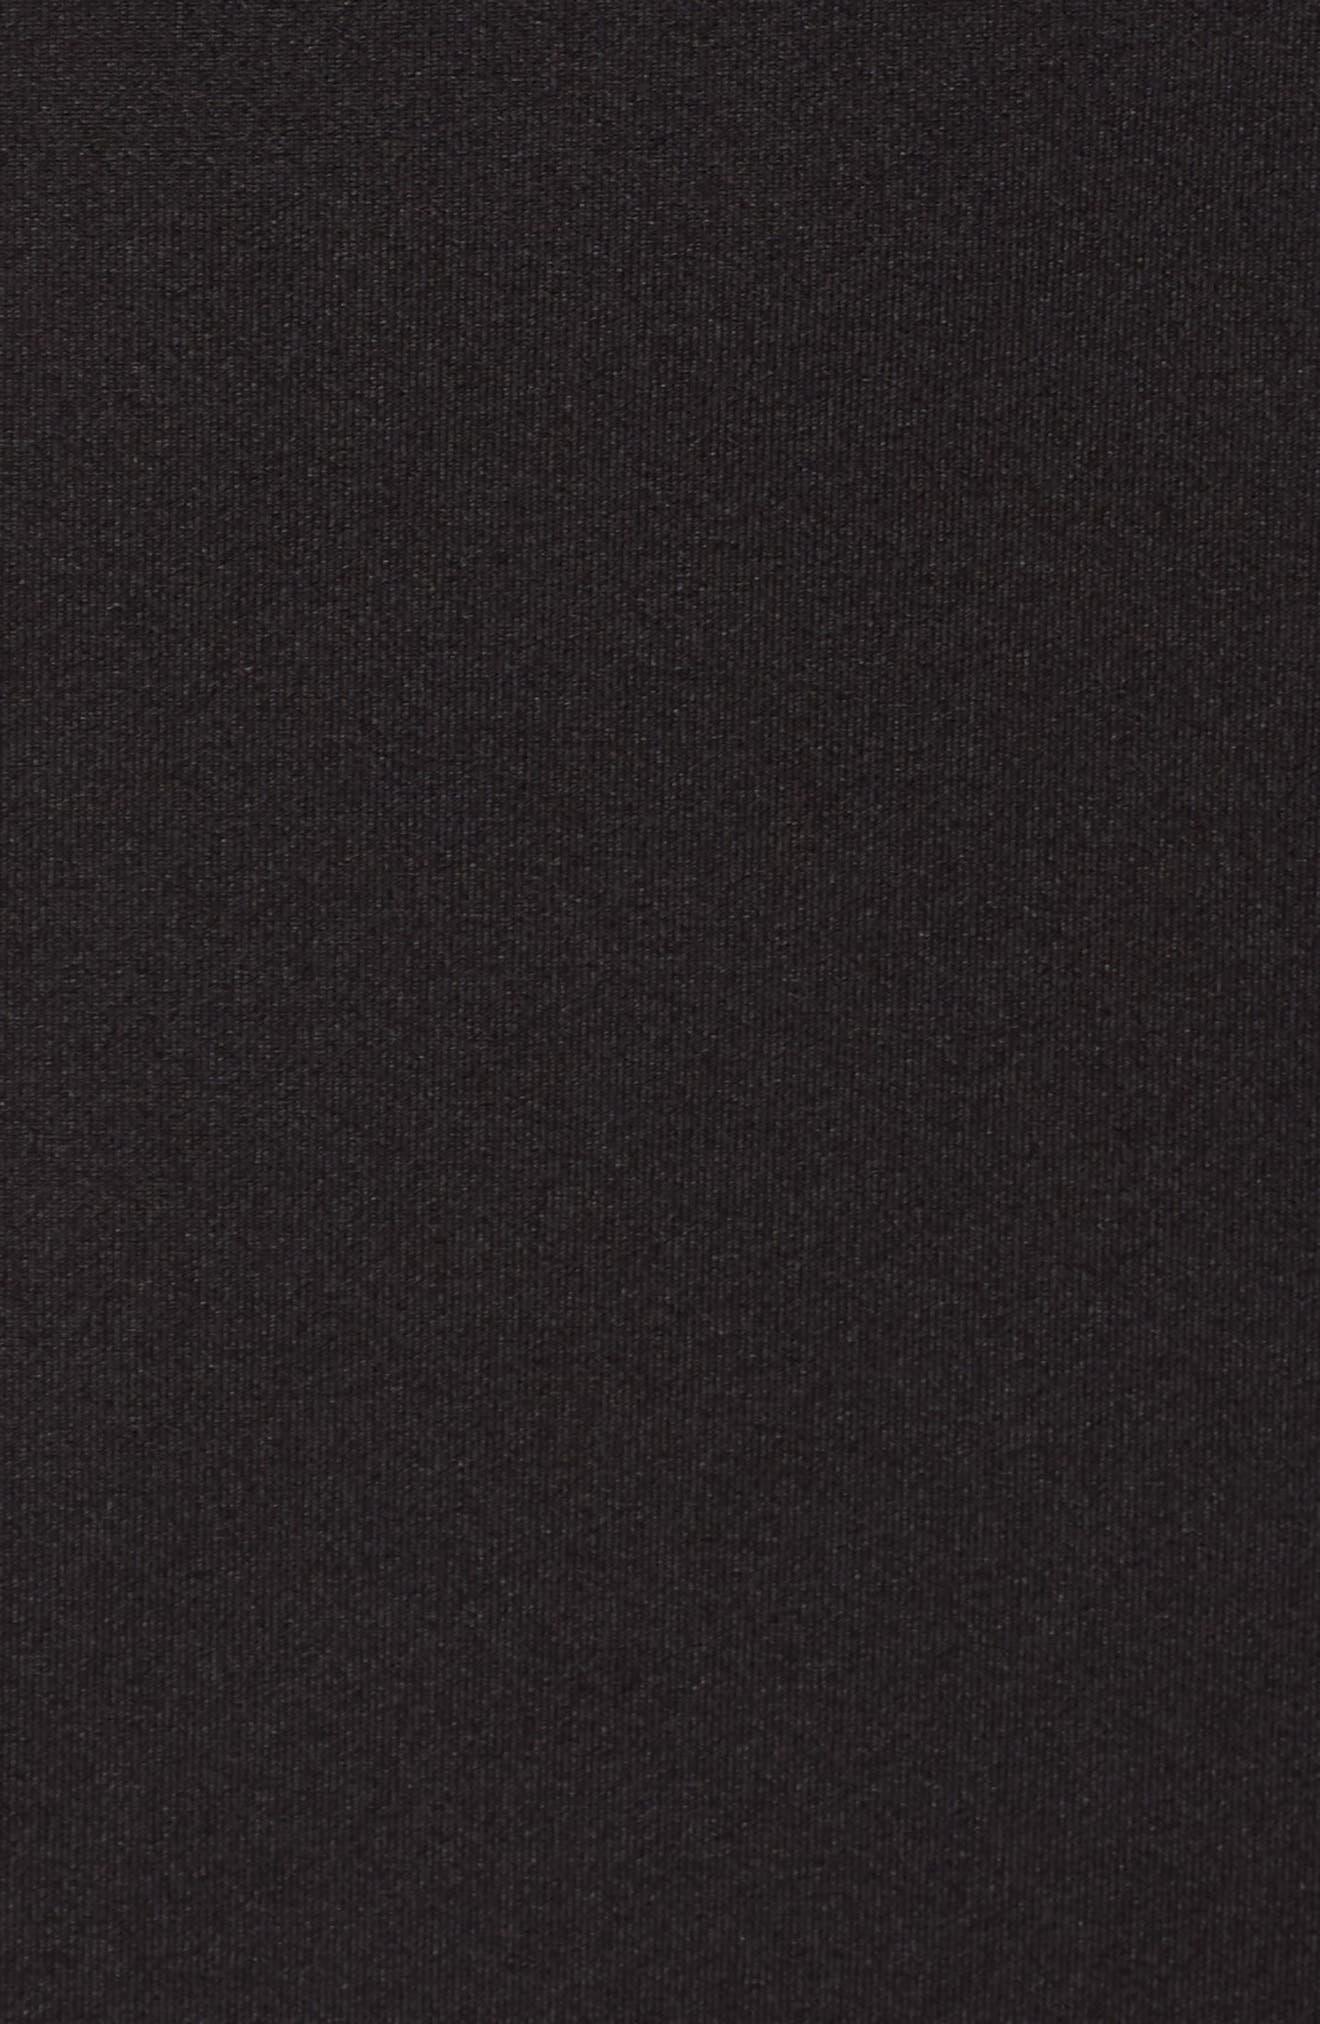 Knit Blazer,                             Alternate thumbnail 6, color,                             Black